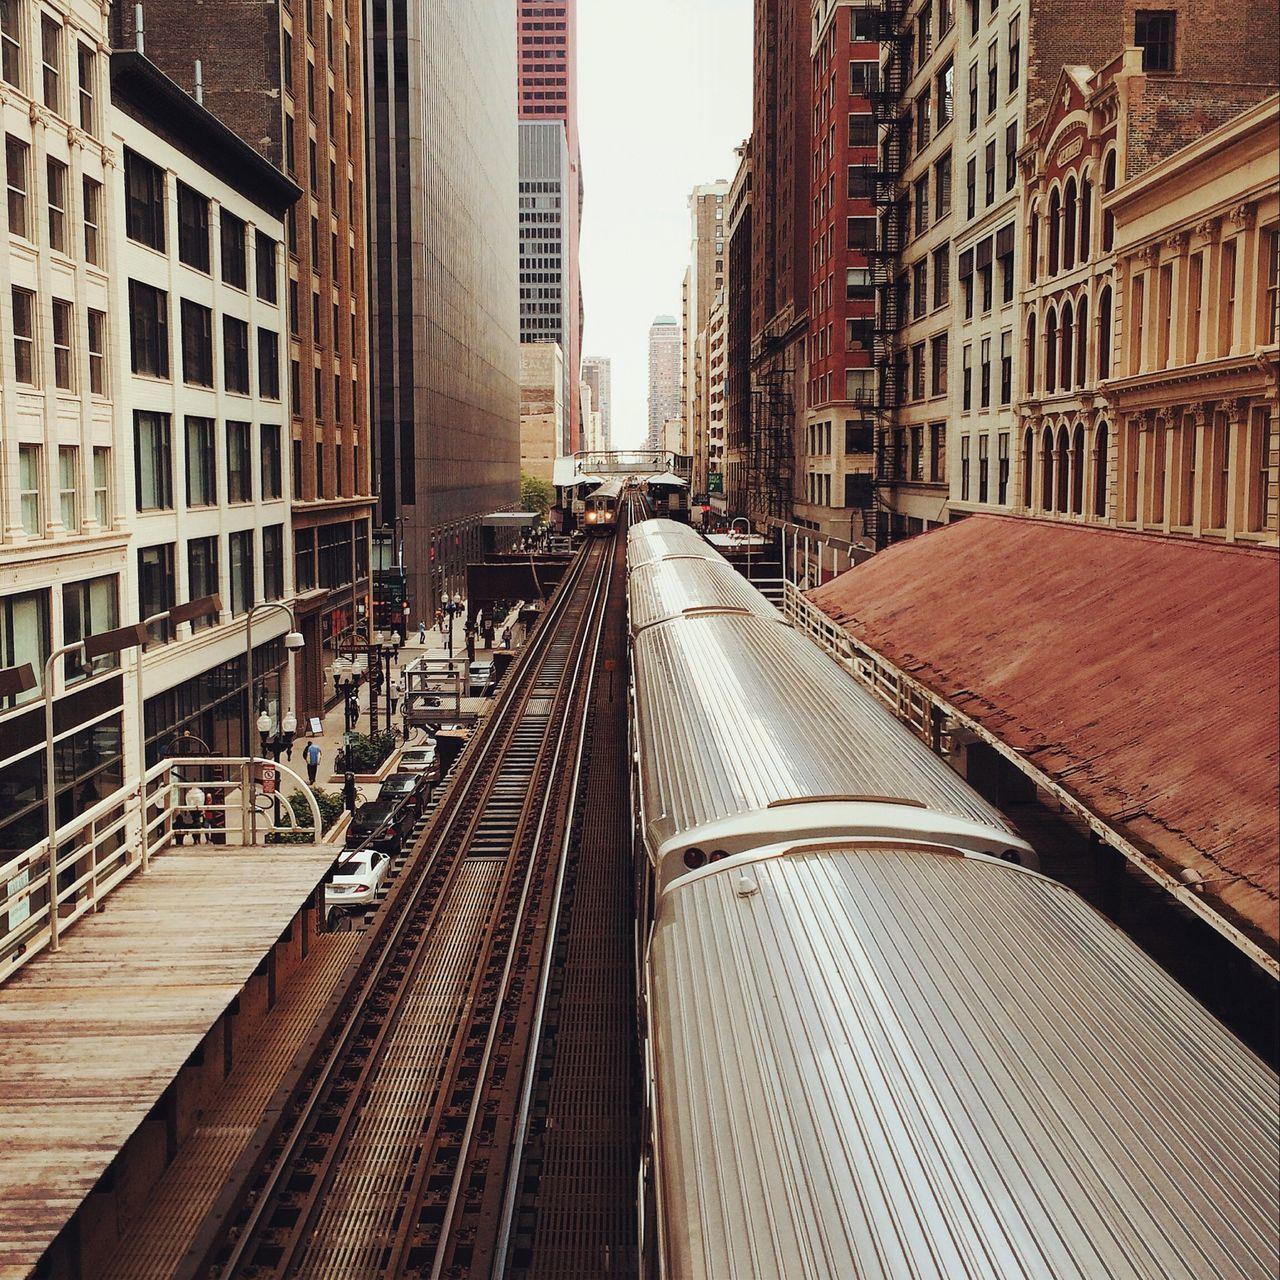 Beautiful stock photos of train, Architecture, Building Exterior, City, City Life